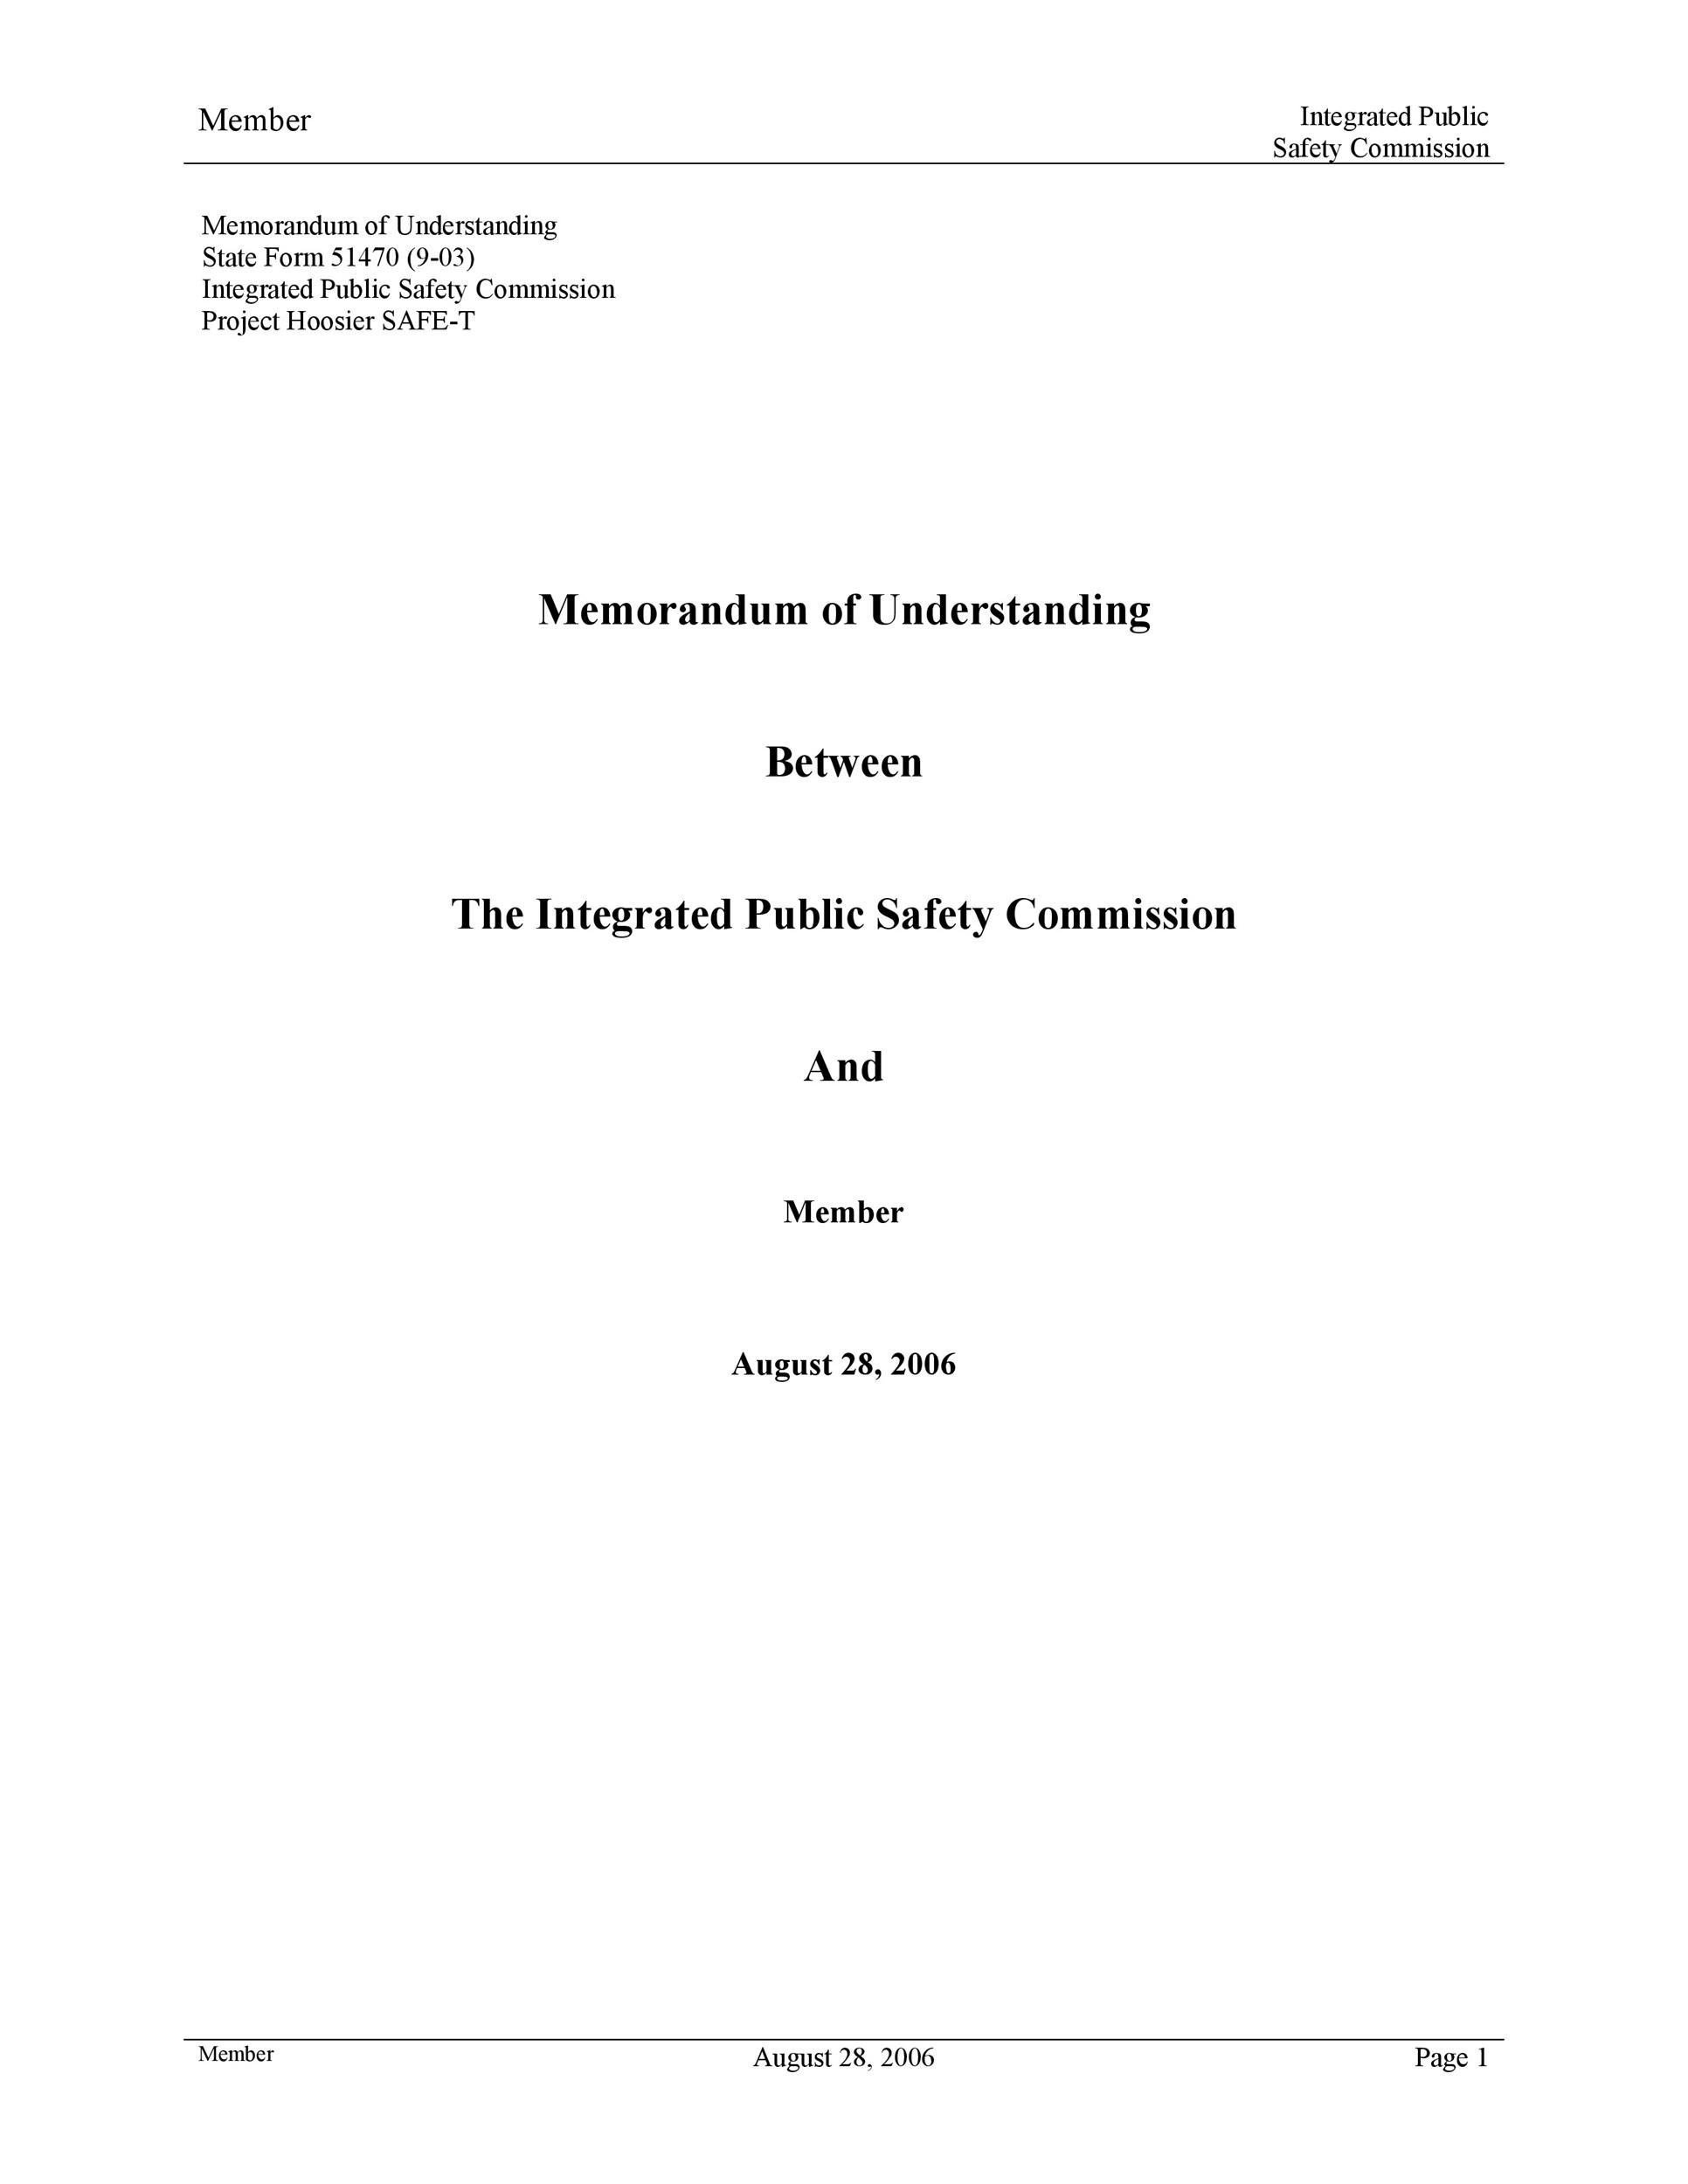 Free Memorandum of Understanding Template 32